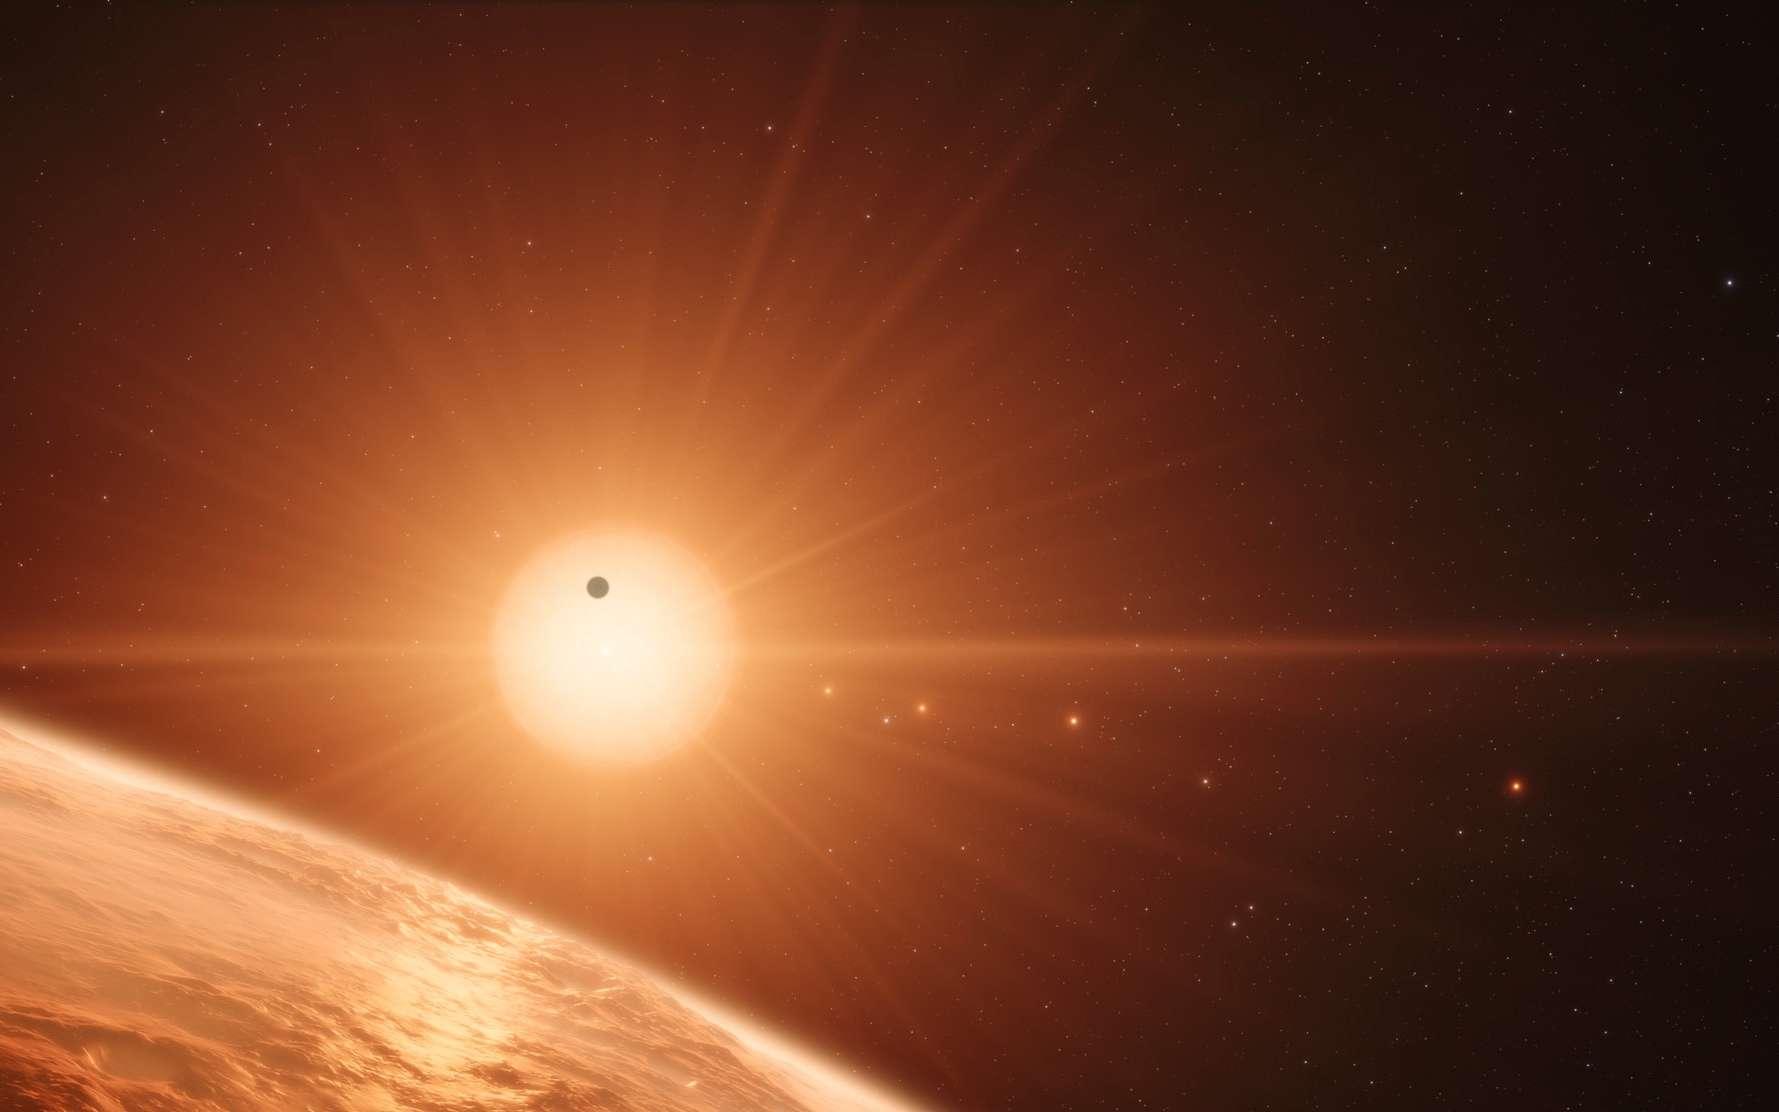 Illustration du système planètaire Trappist-1. © ESO, N. Bartmann, spaceengine.org